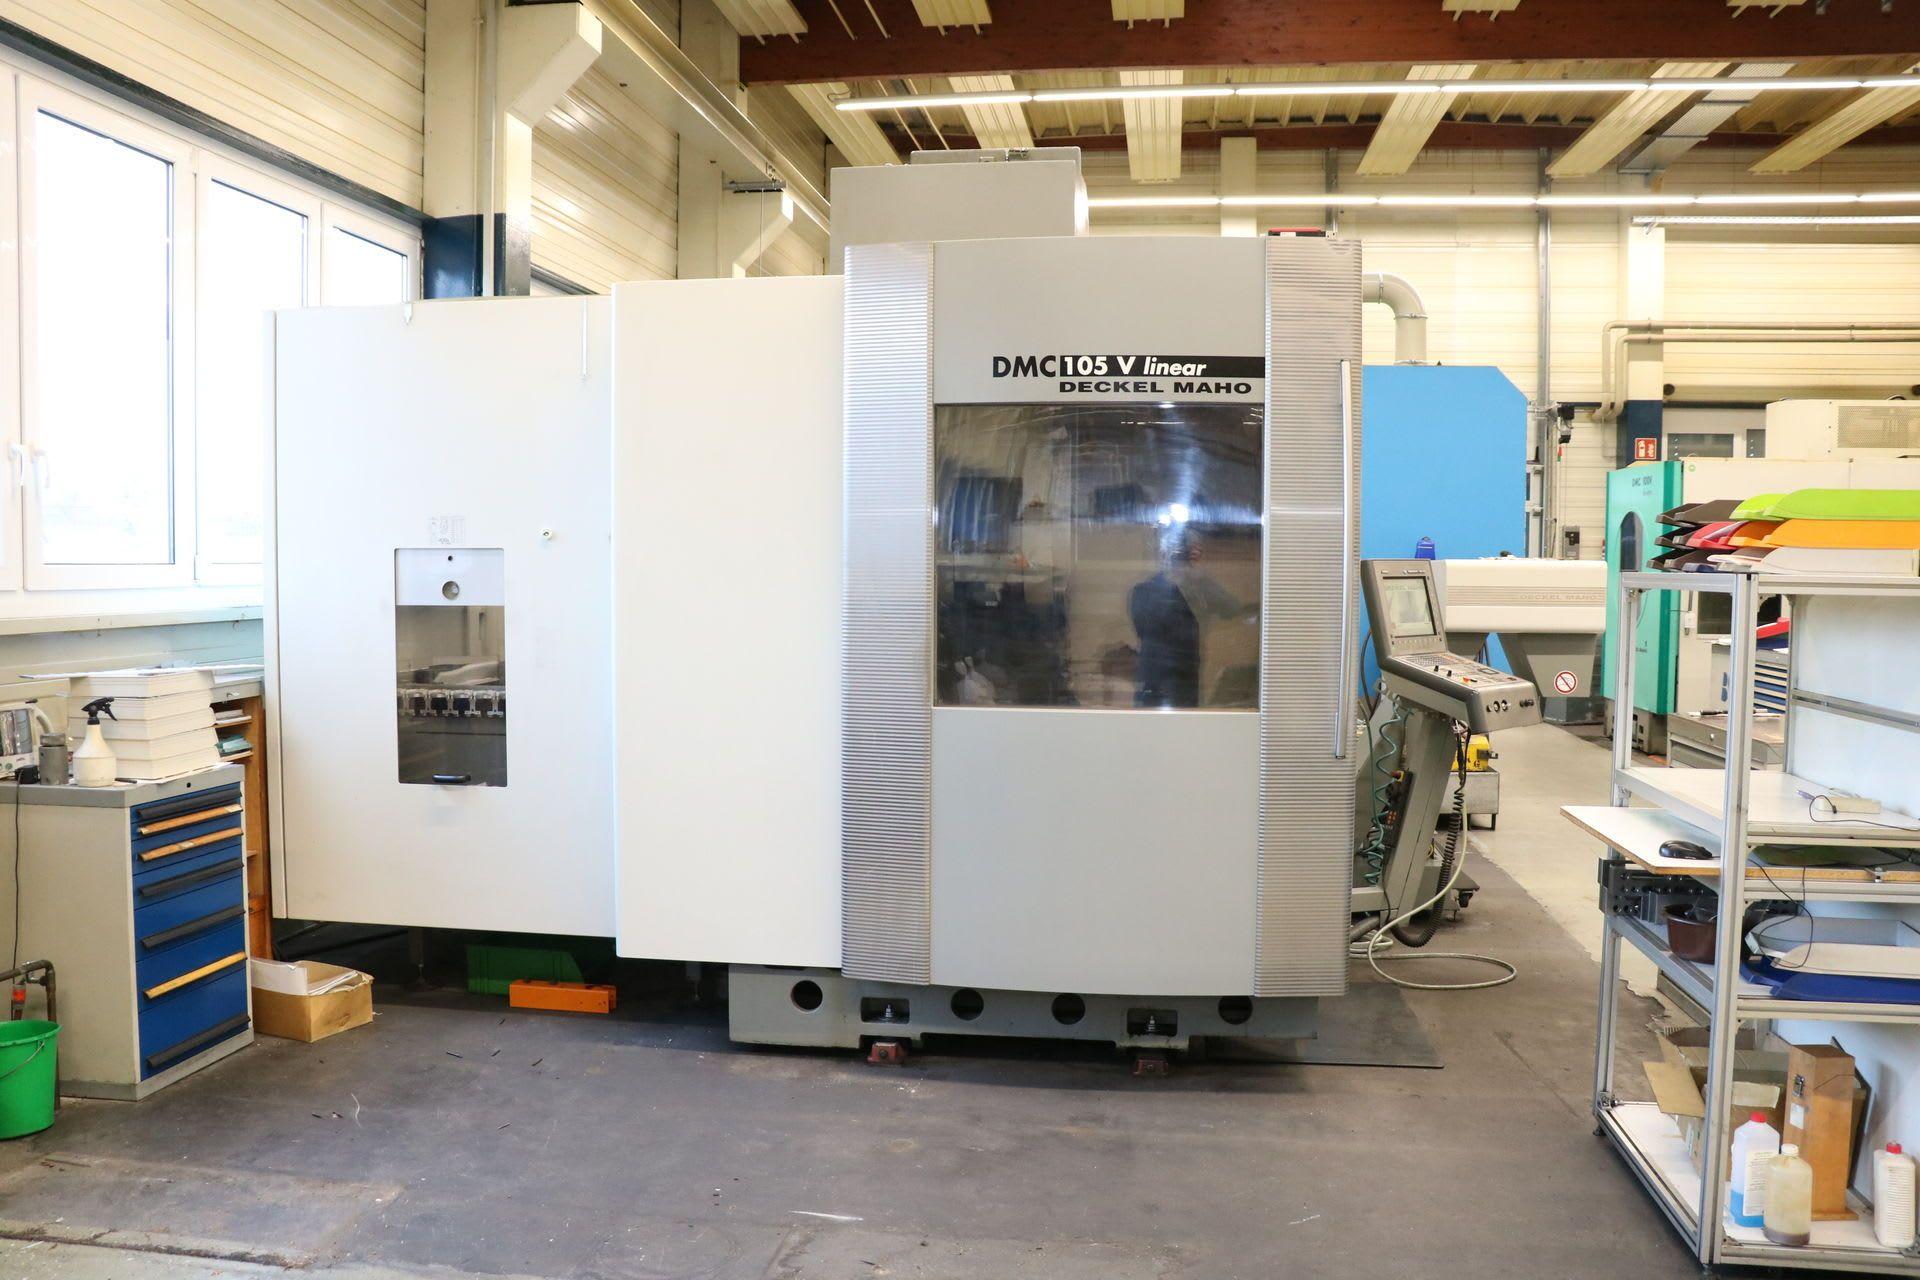 DECKEL MAHO DMC 105 V lineal 5-Achs-Universal-Bearbeitungszentrum